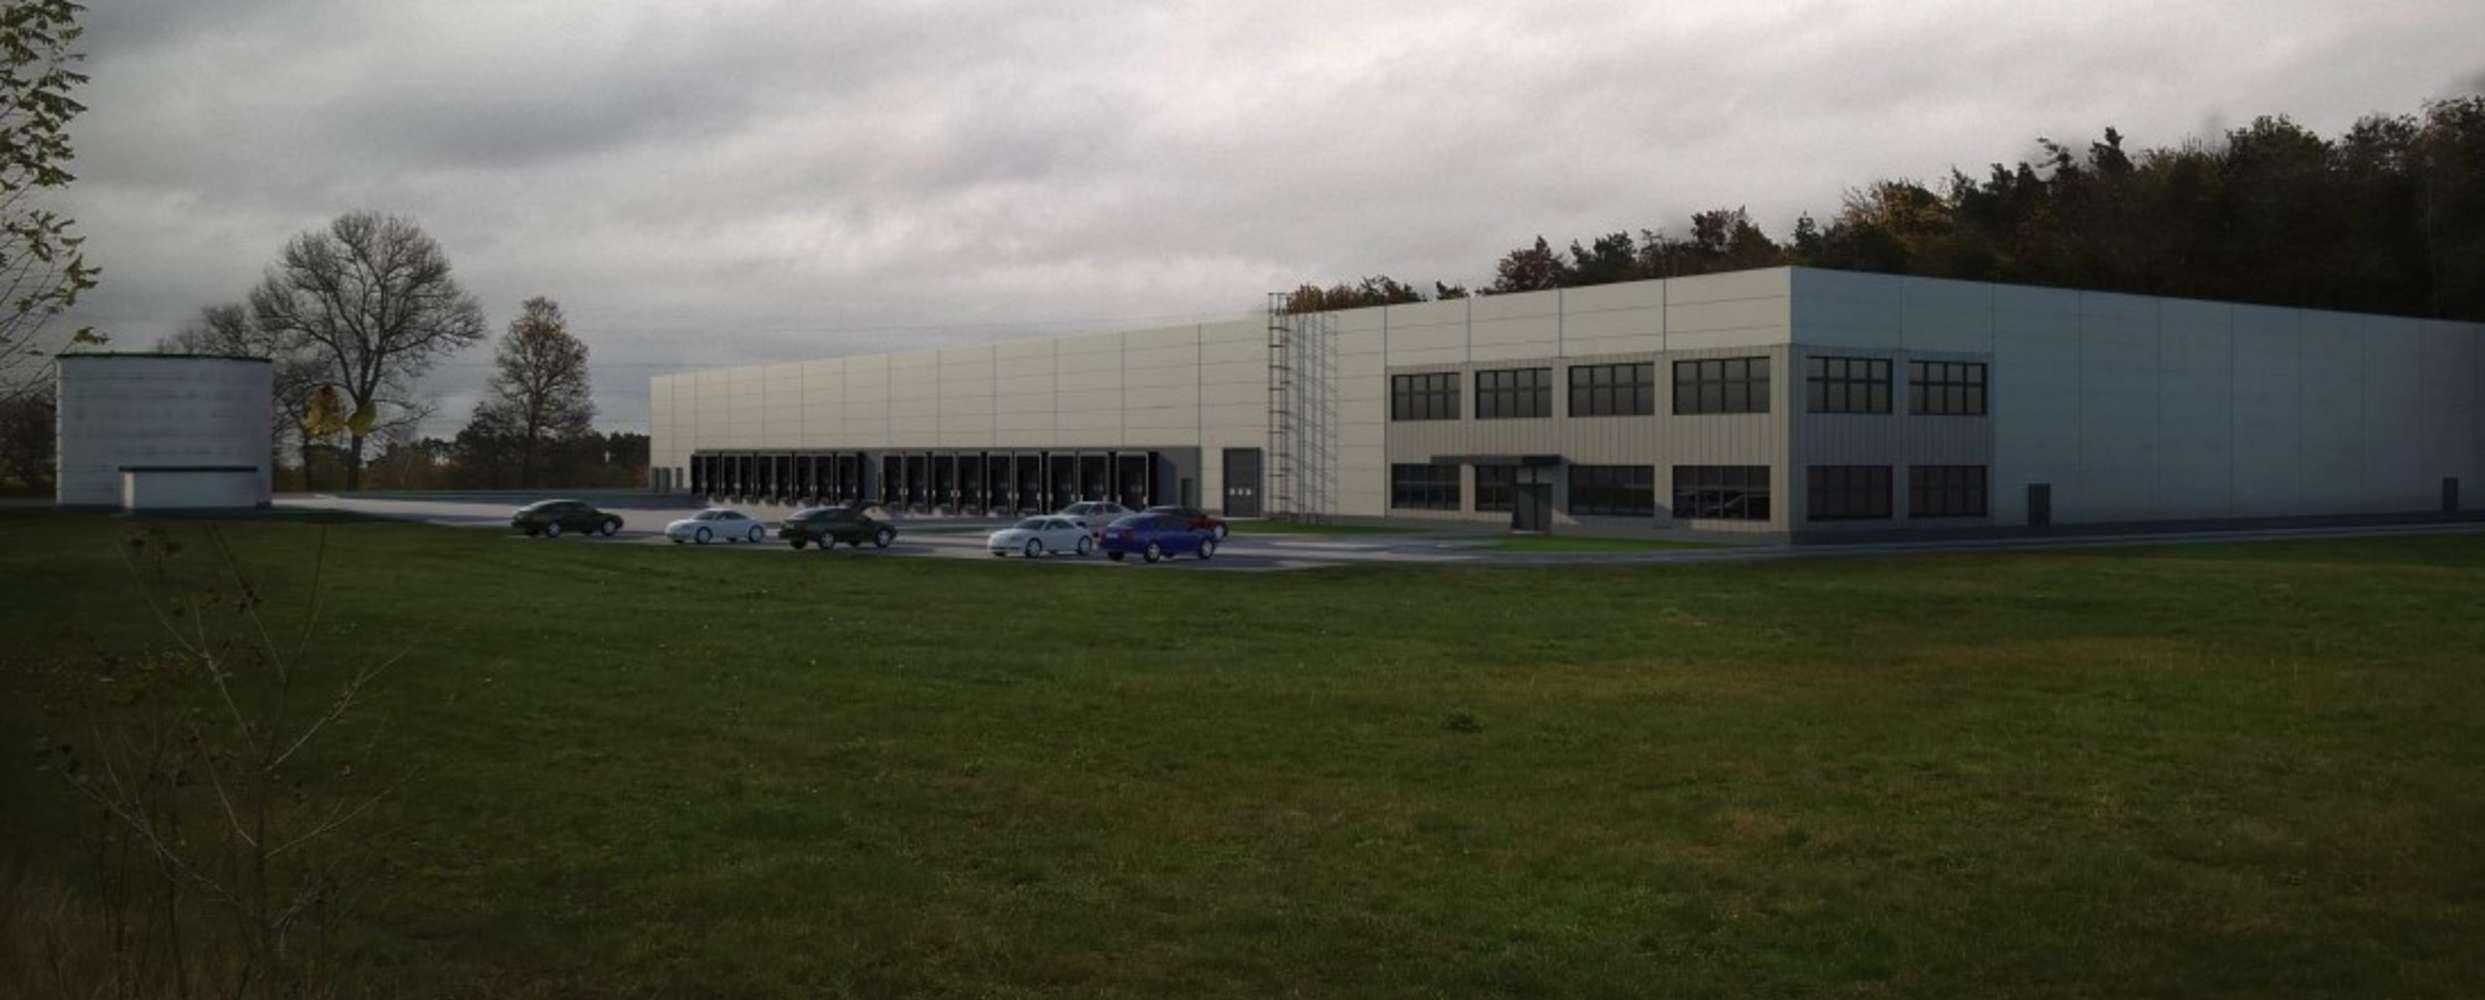 Industrial and logistics Steblova, 533 45 - Industrial Park Pardubice - Stéblová